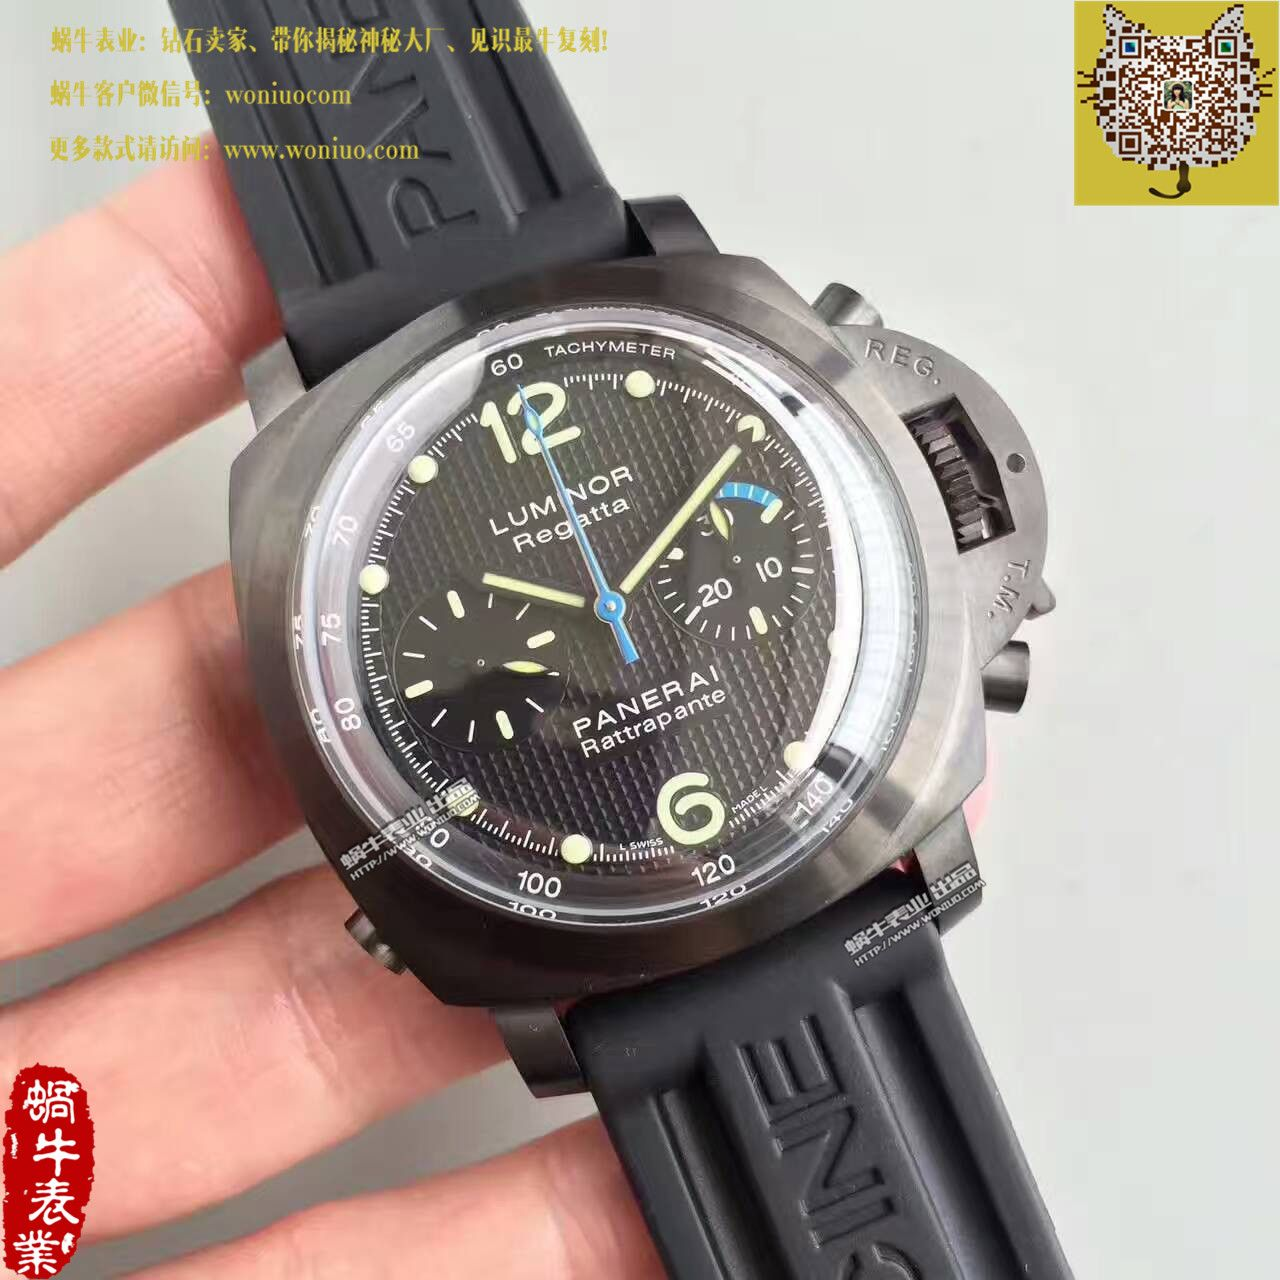 【XF厂顶级复刻手表】沛纳海限量珍藏款系列PAM 00332史泰龙敢死队同款腕表 / PA088